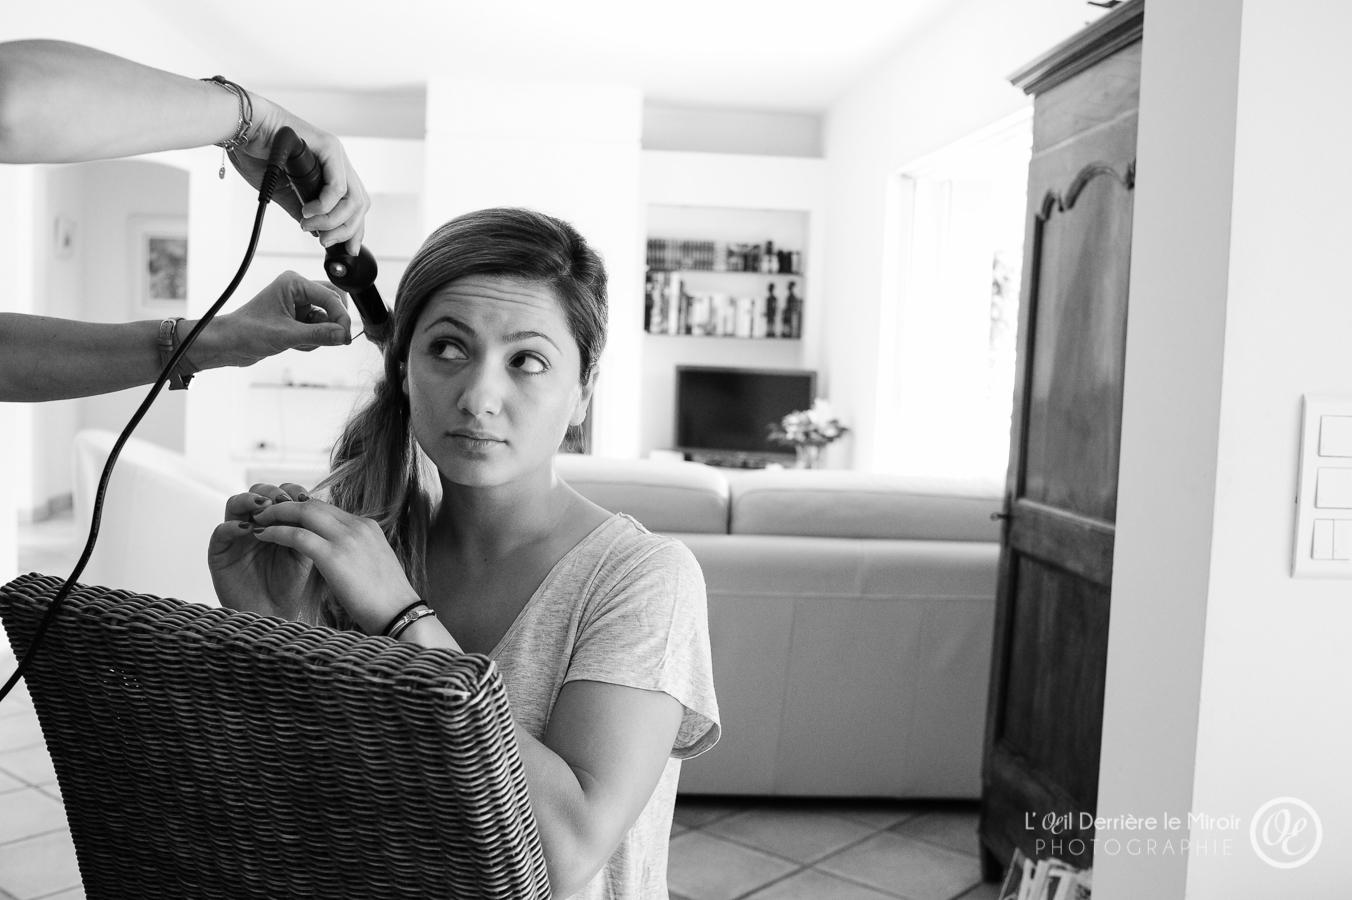 Photographe-Mariage-grasse-loeilderrierelemiroir-jt-161